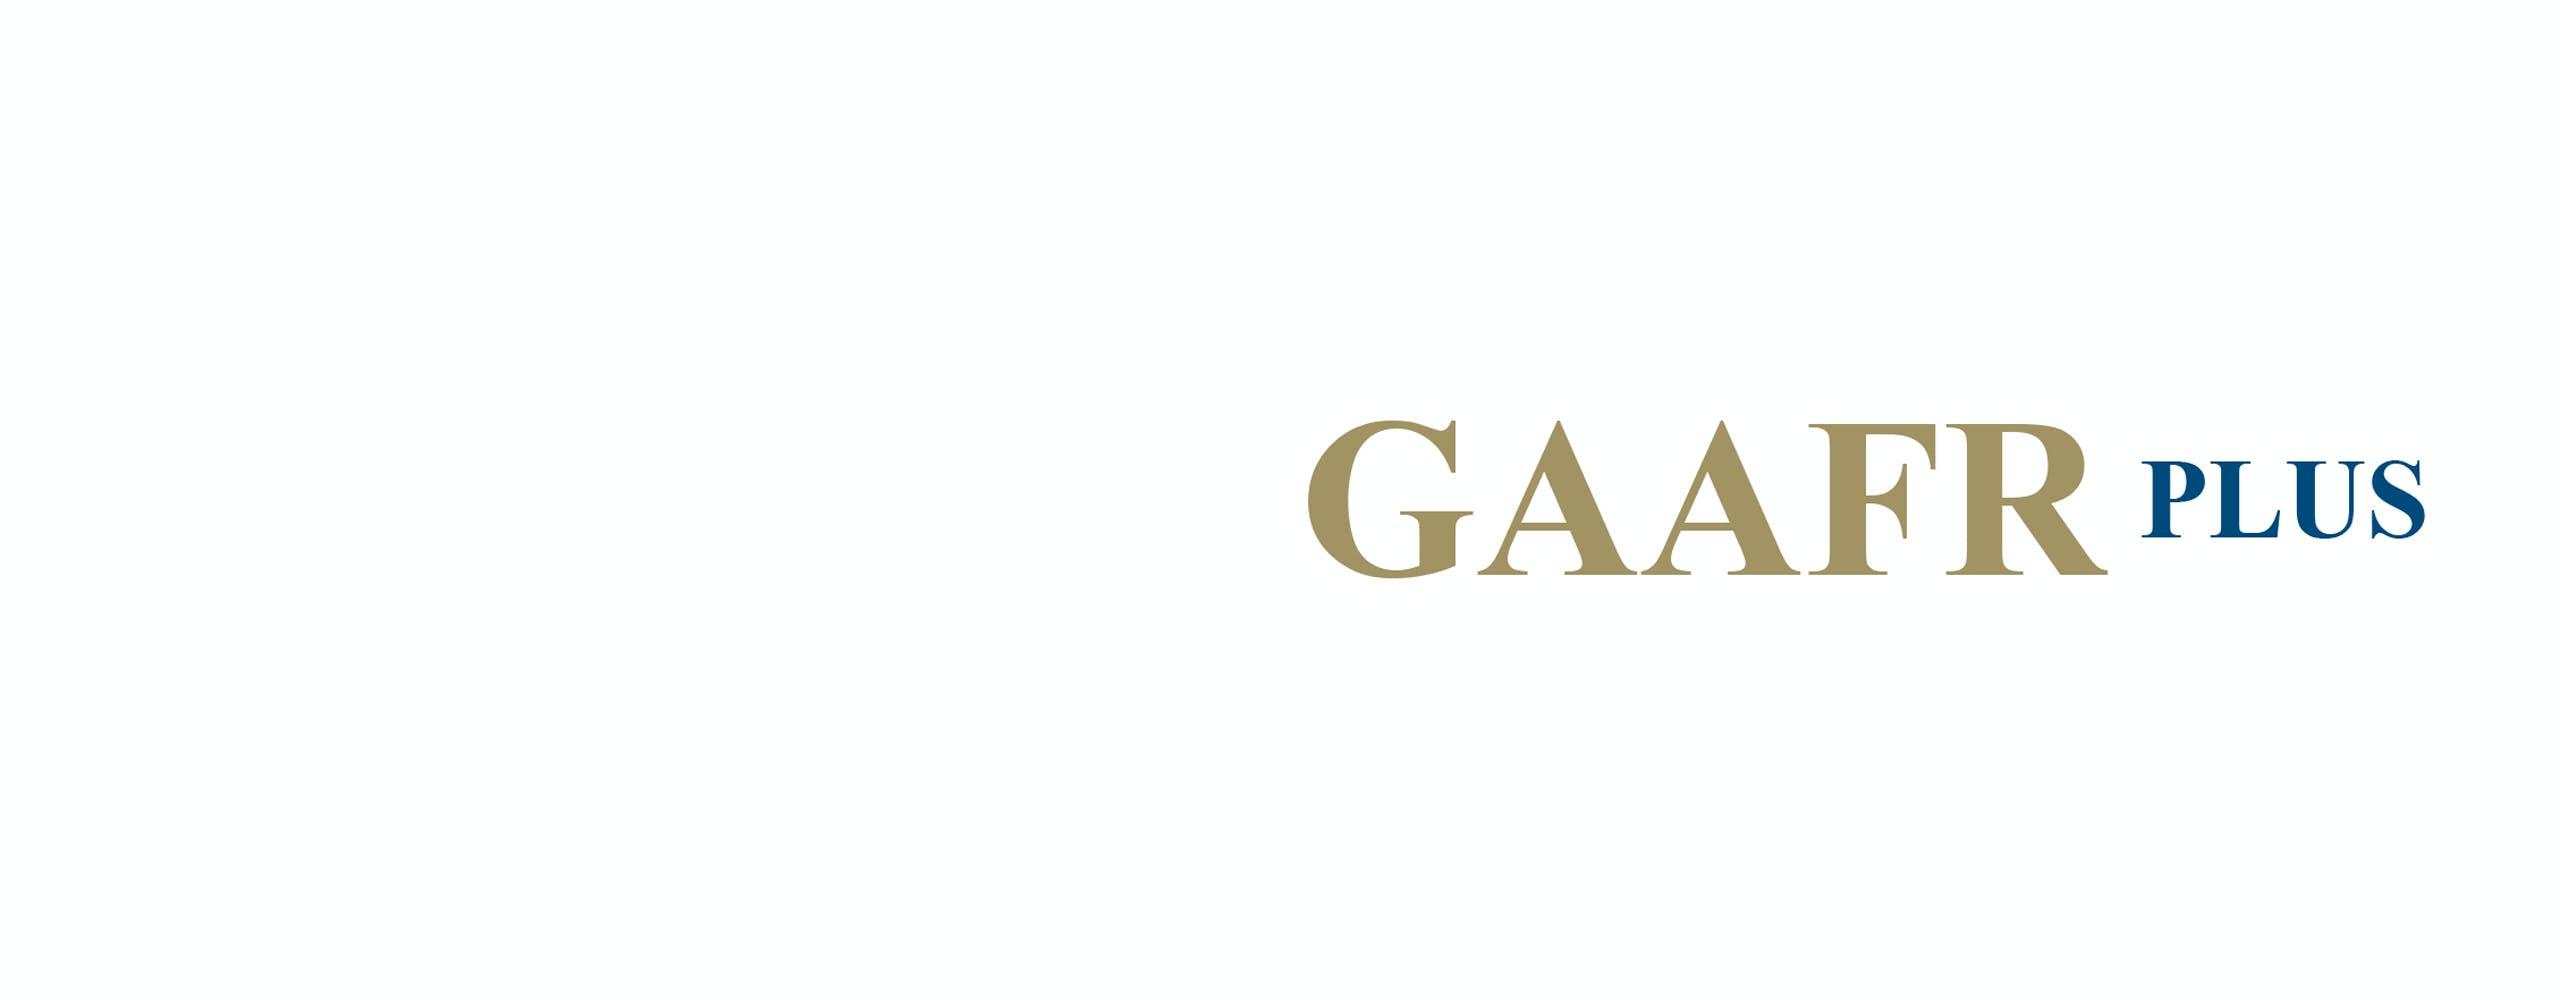 GAAFR Plus Logo